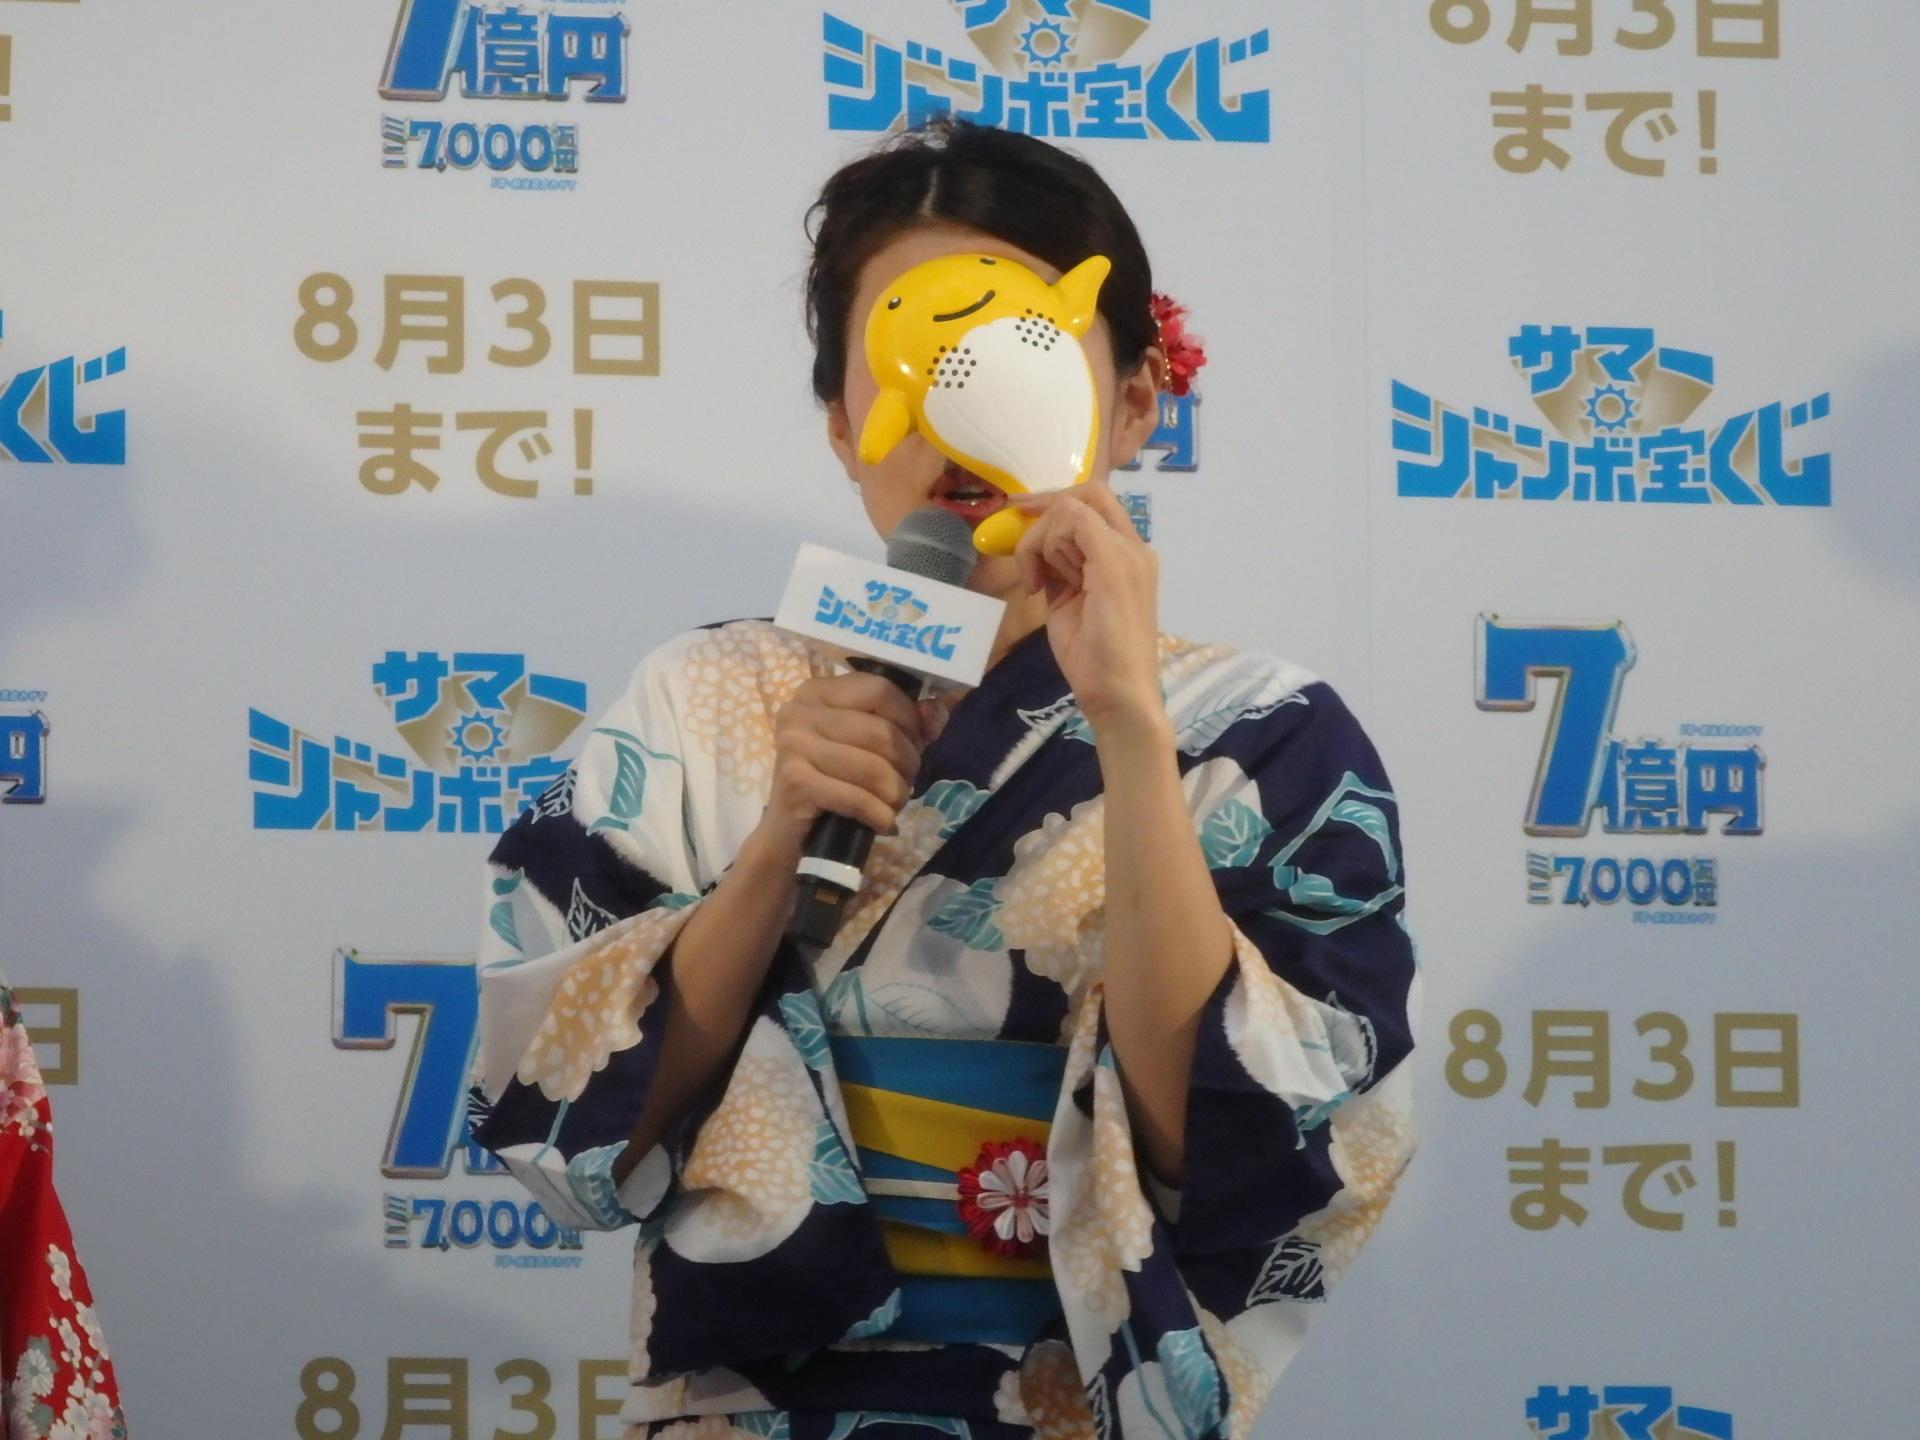 http://news.yoshimoto.co.jp/20180709202916-a079ef428d5fb72debf5917e446905eb6c38b9aa.jpg